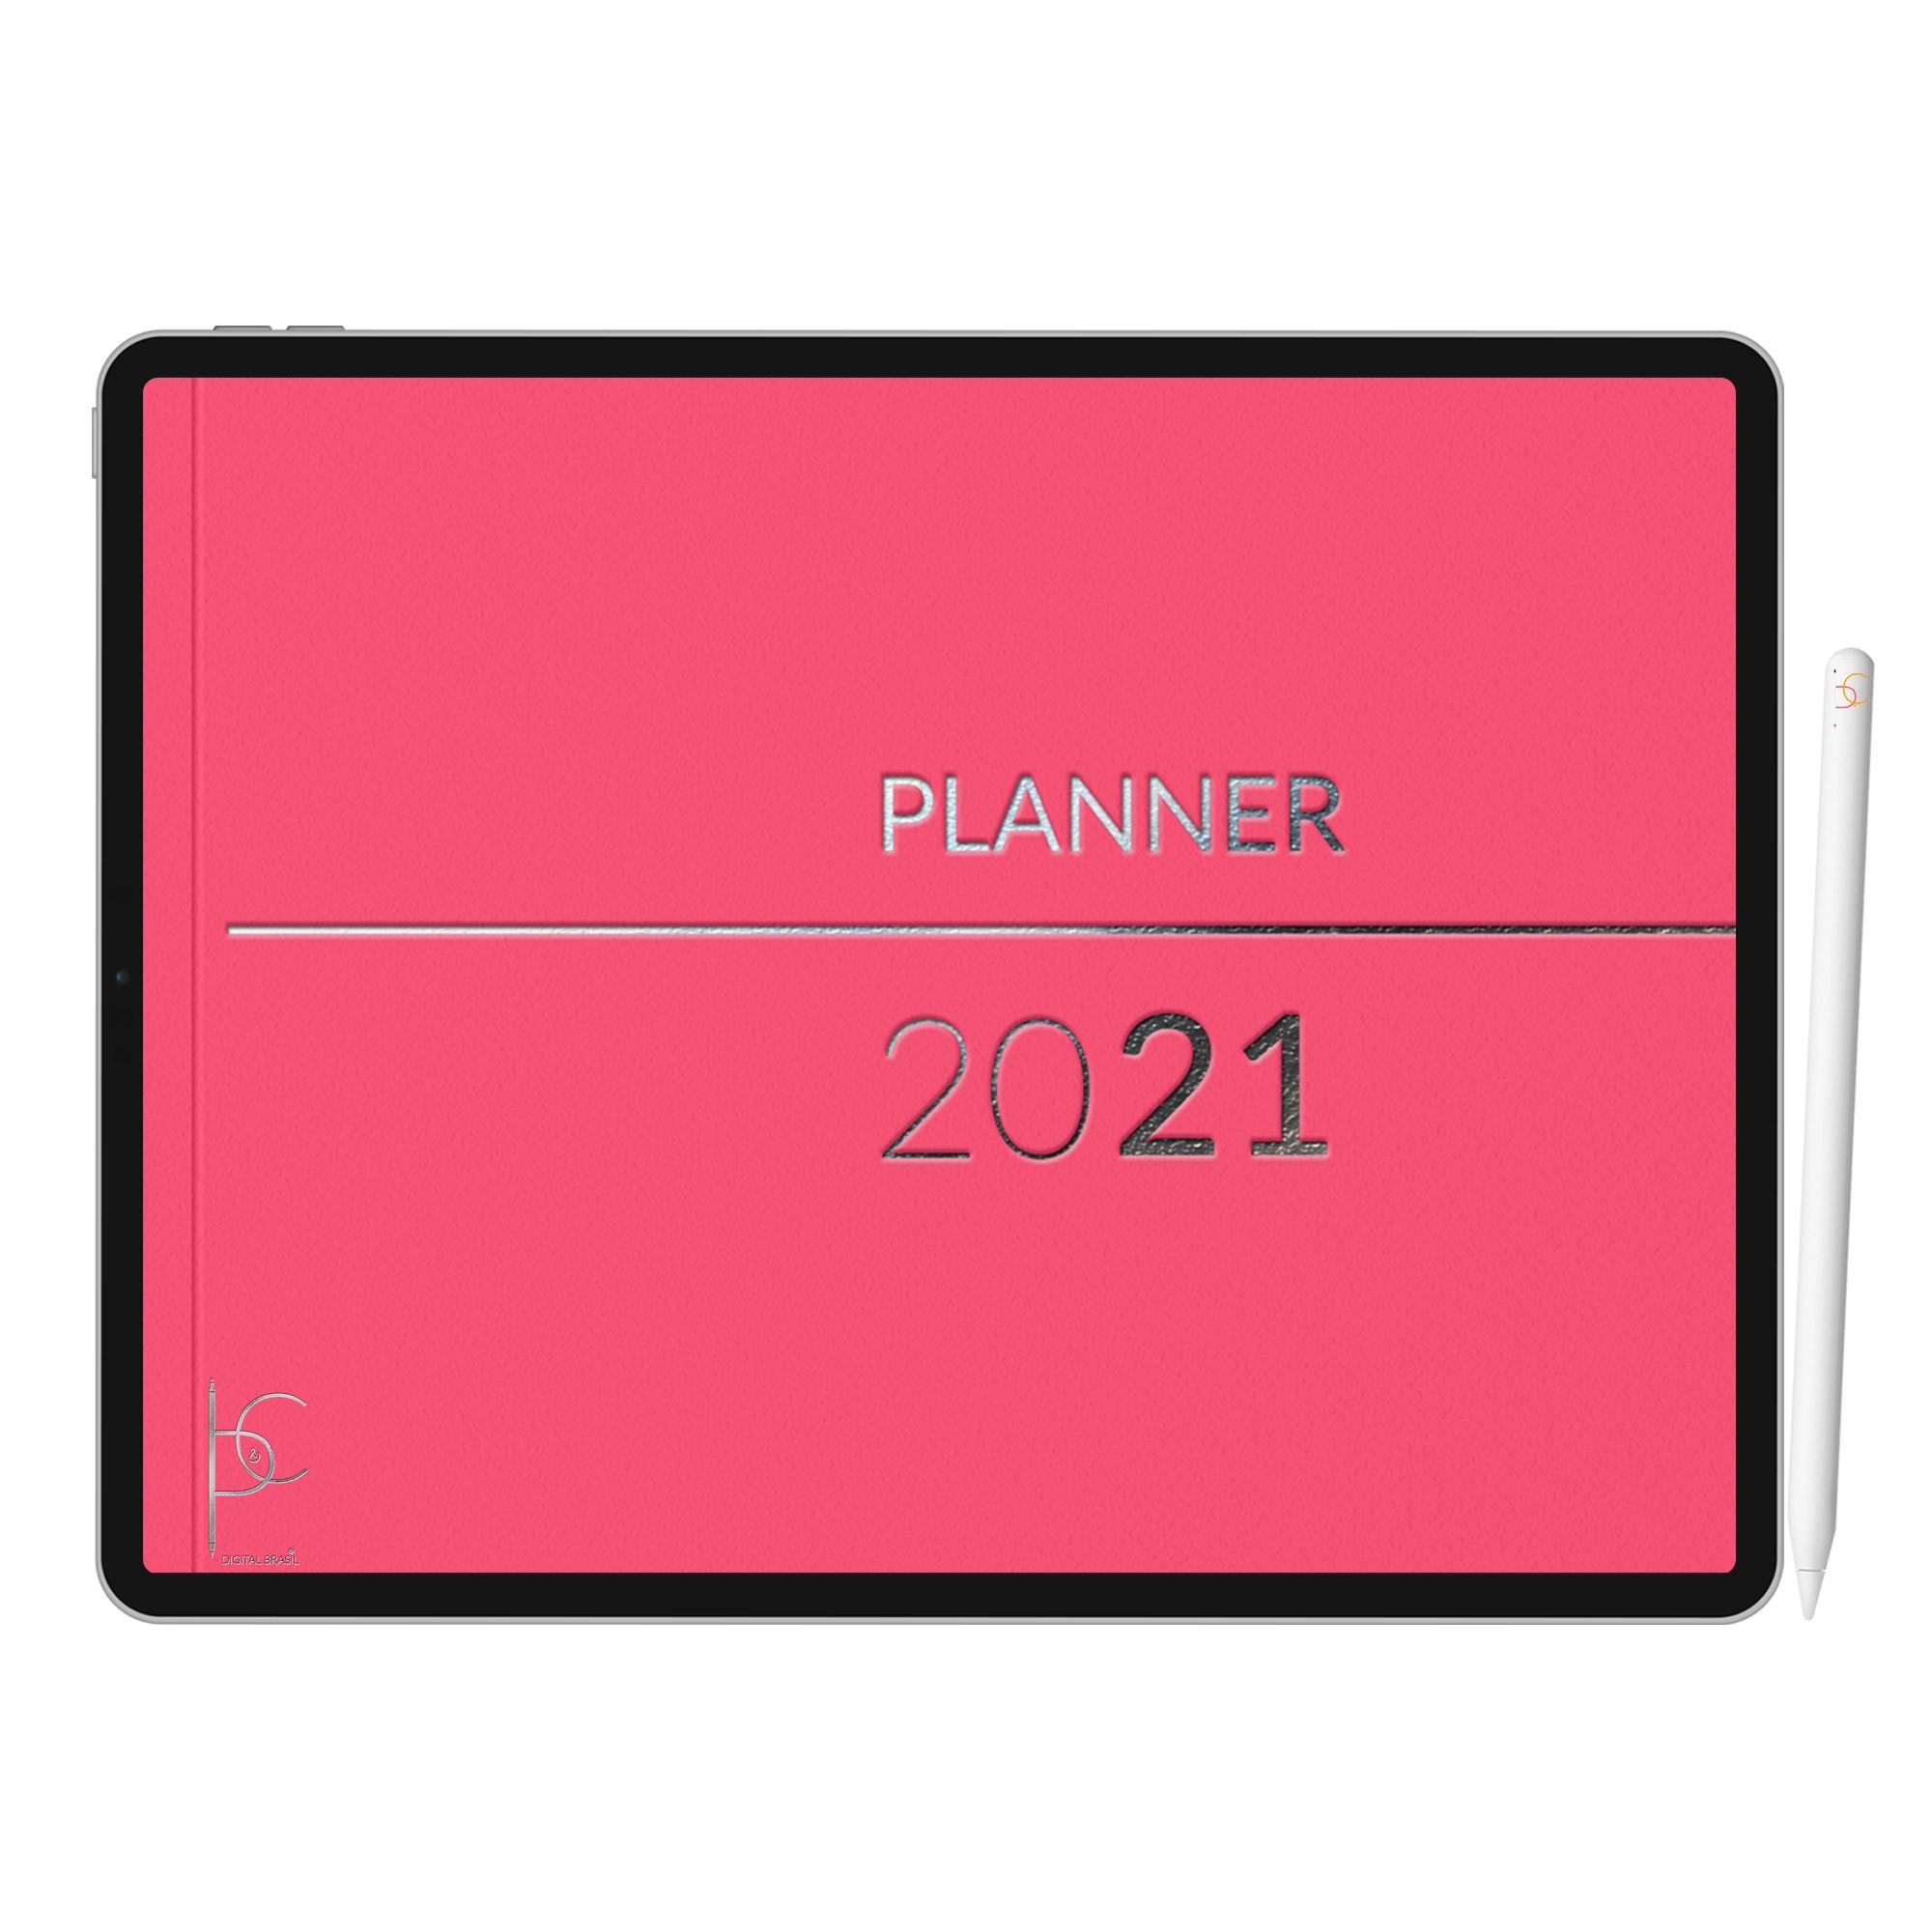 Planner Digital Diário, Semanal, Mensal, Anual | GoodNotes, Xodo, Notability | iPad Tablet | Download Instantâneo